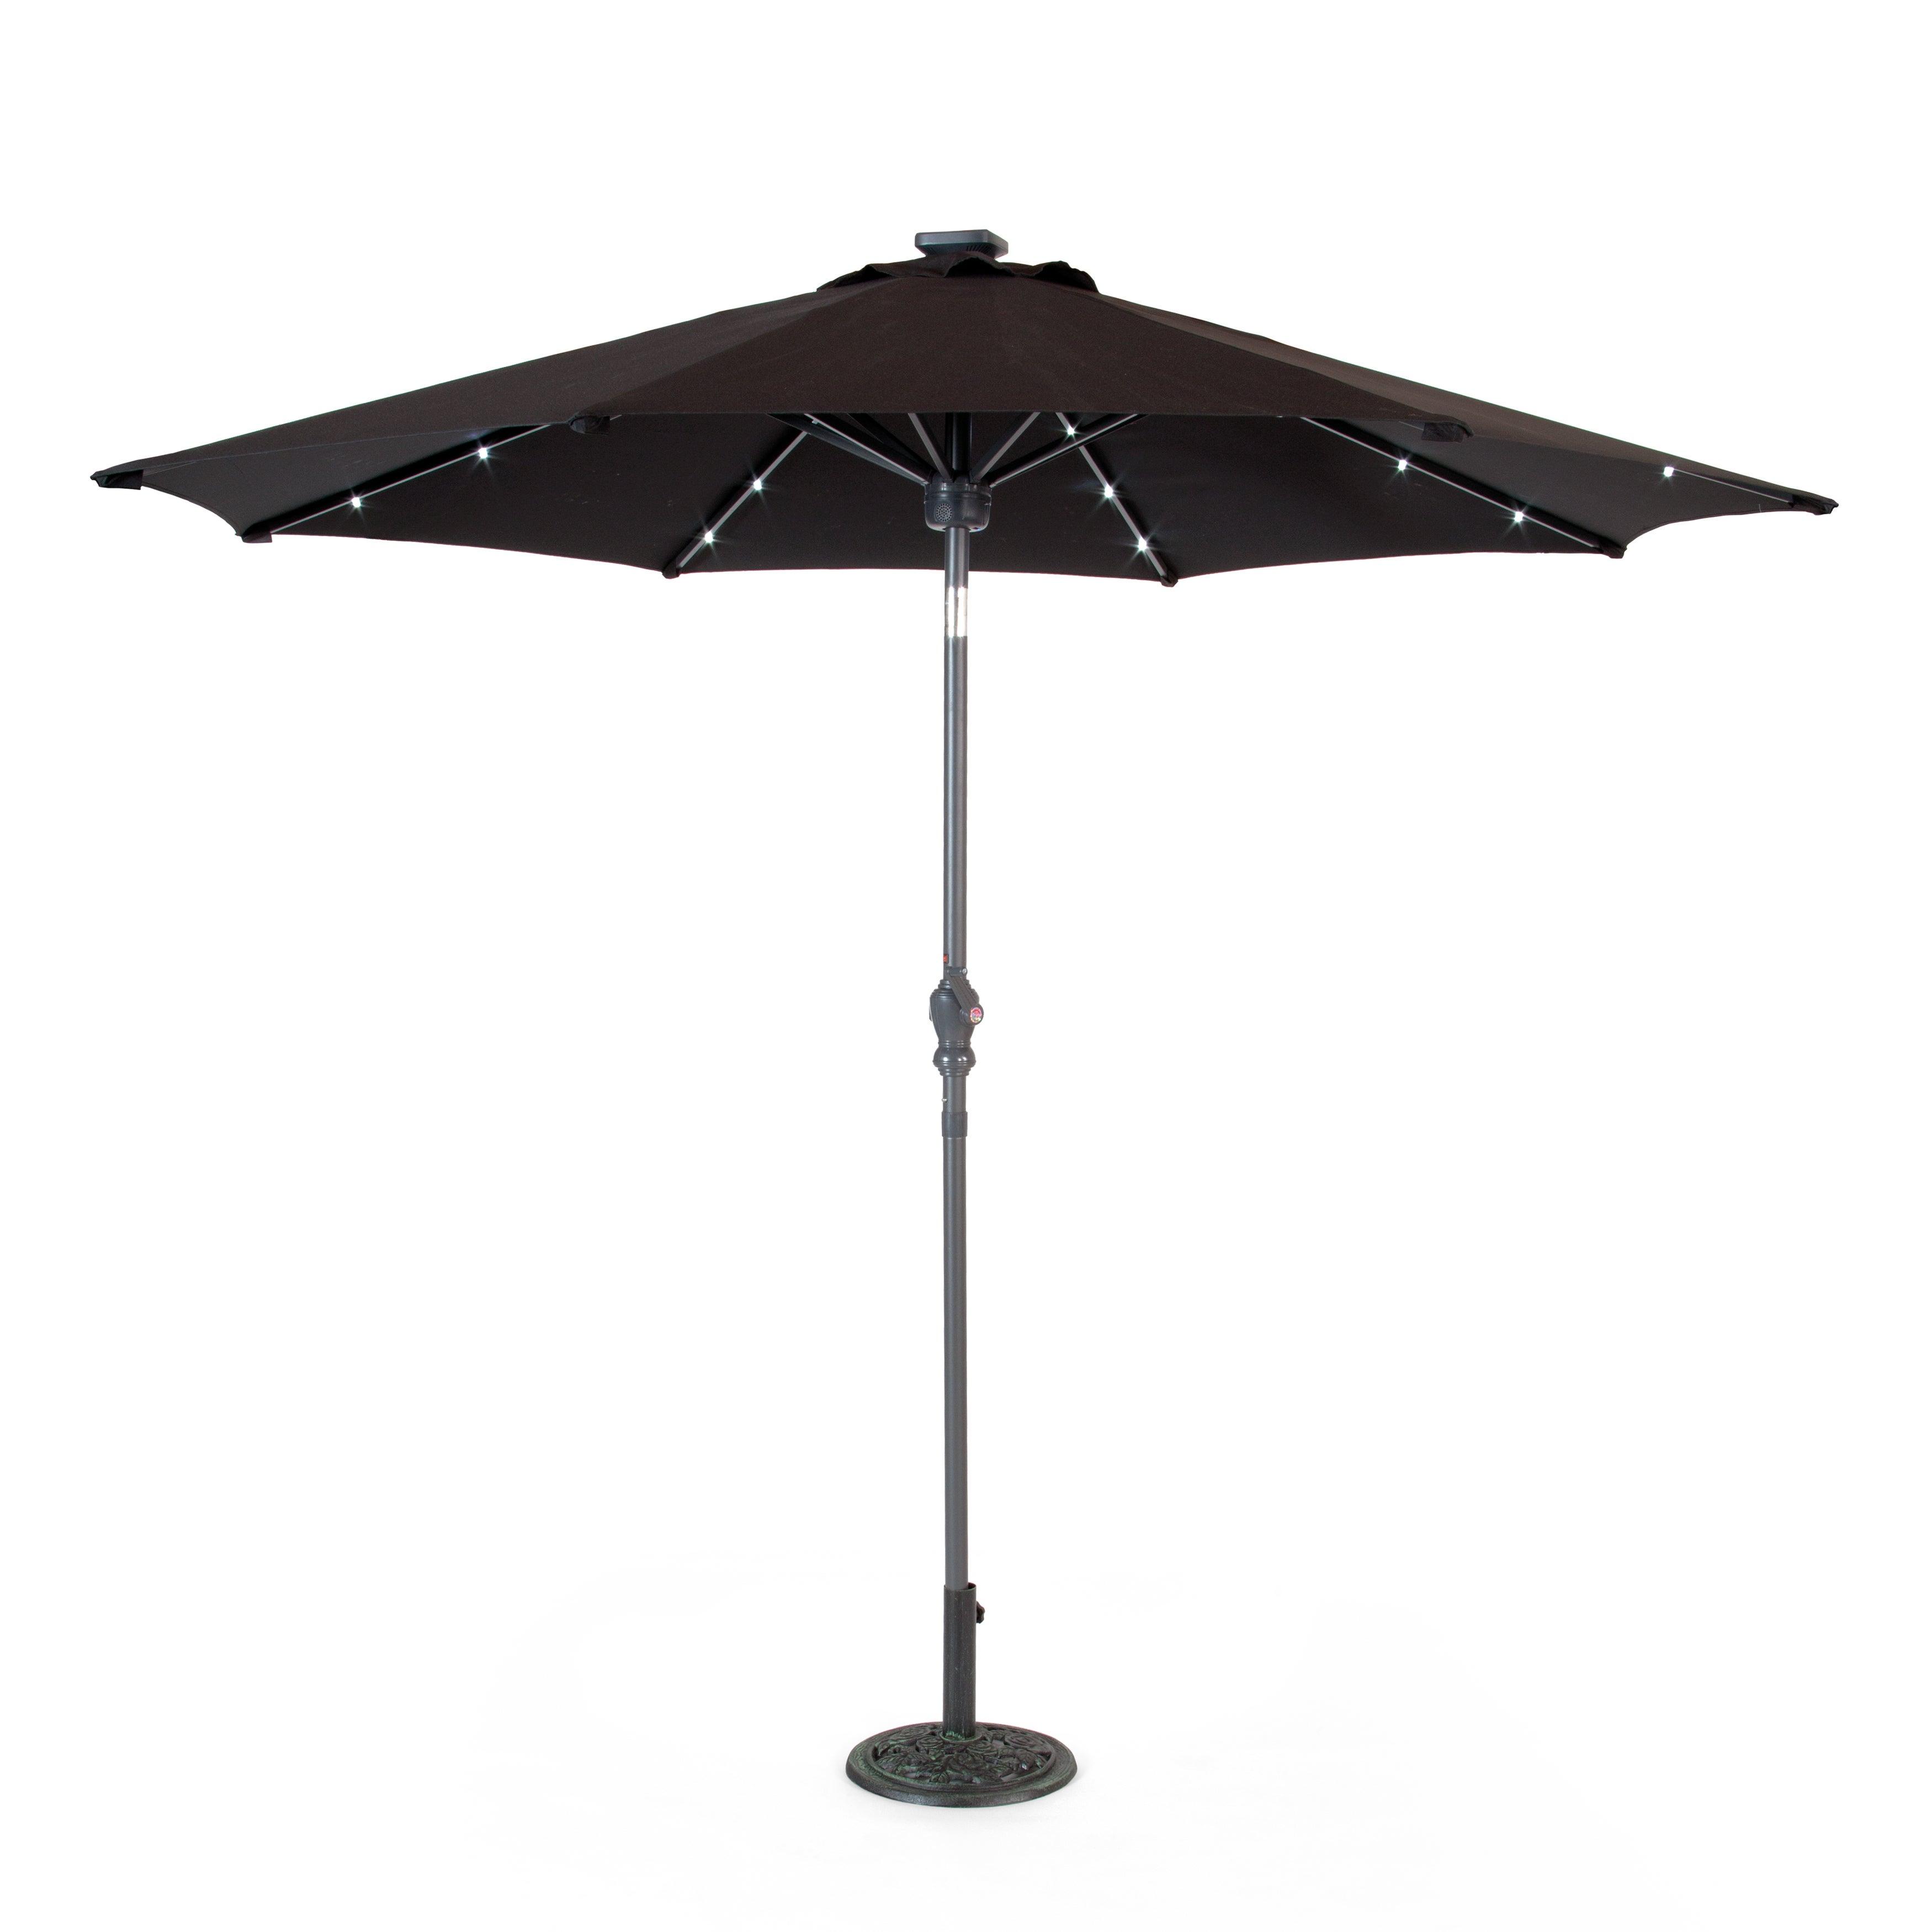 Black Metal/Fabric 8.5-foot Market Umbrella with Solar-Po...